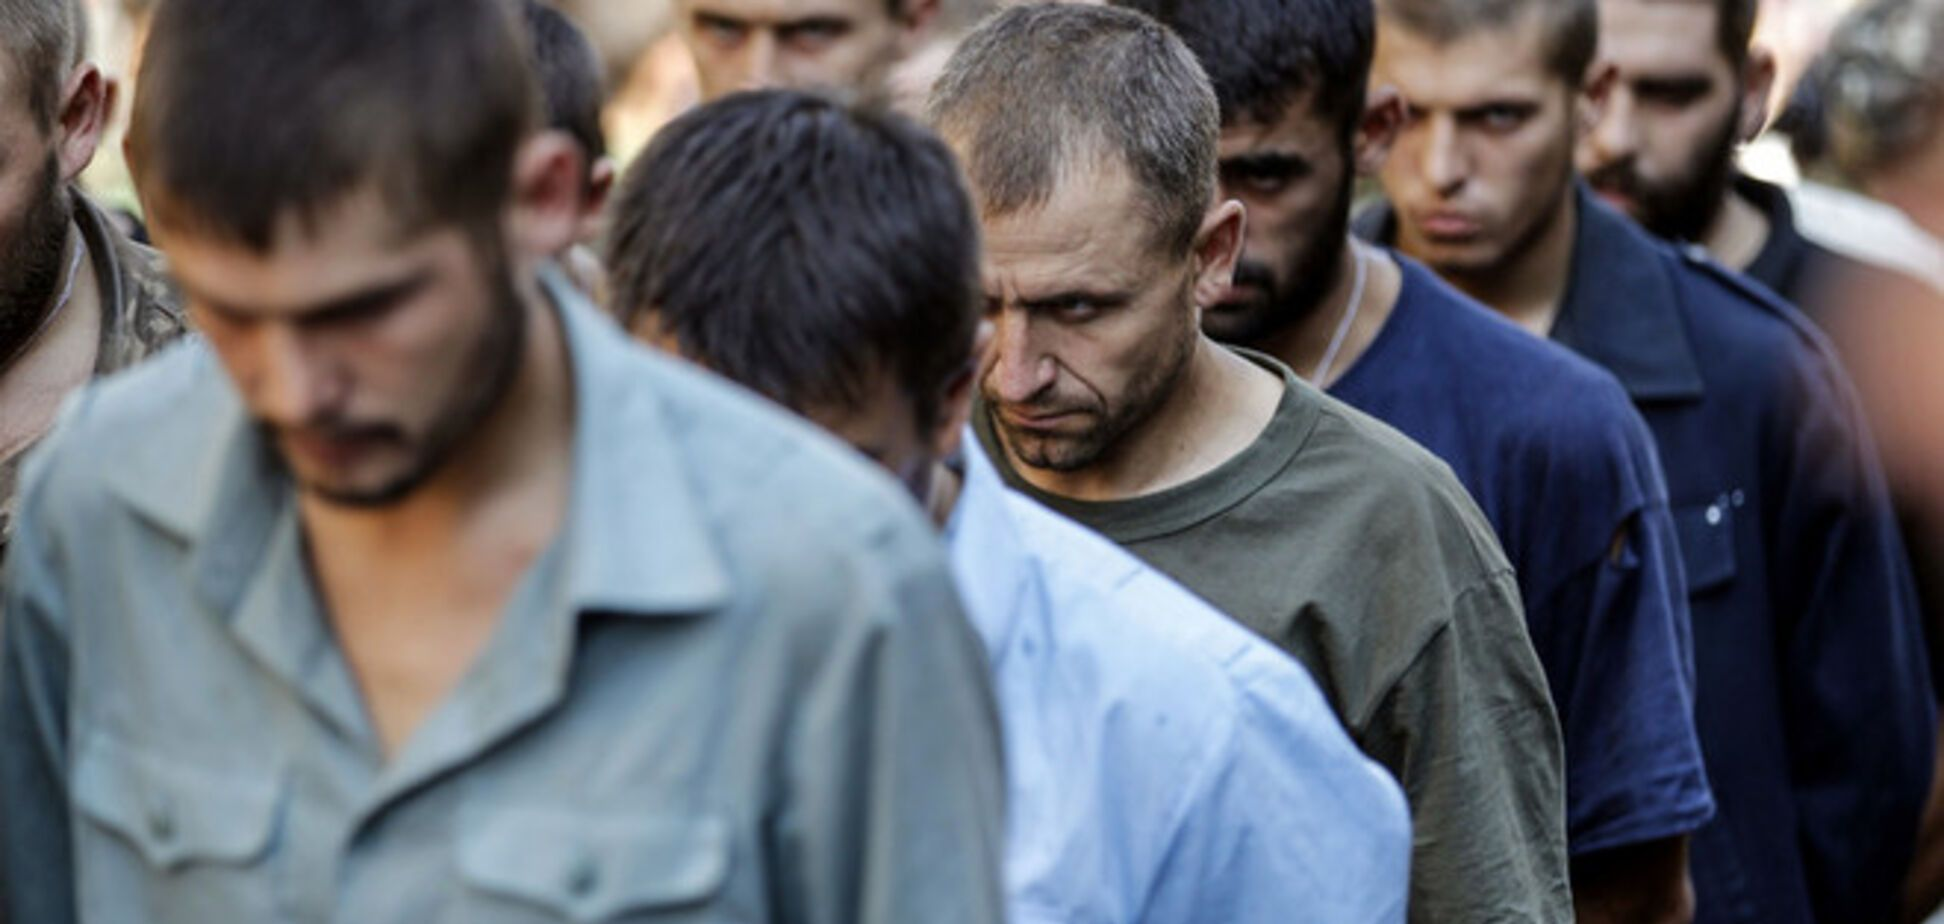 В плену у террористов более 800 украинцев - журналист